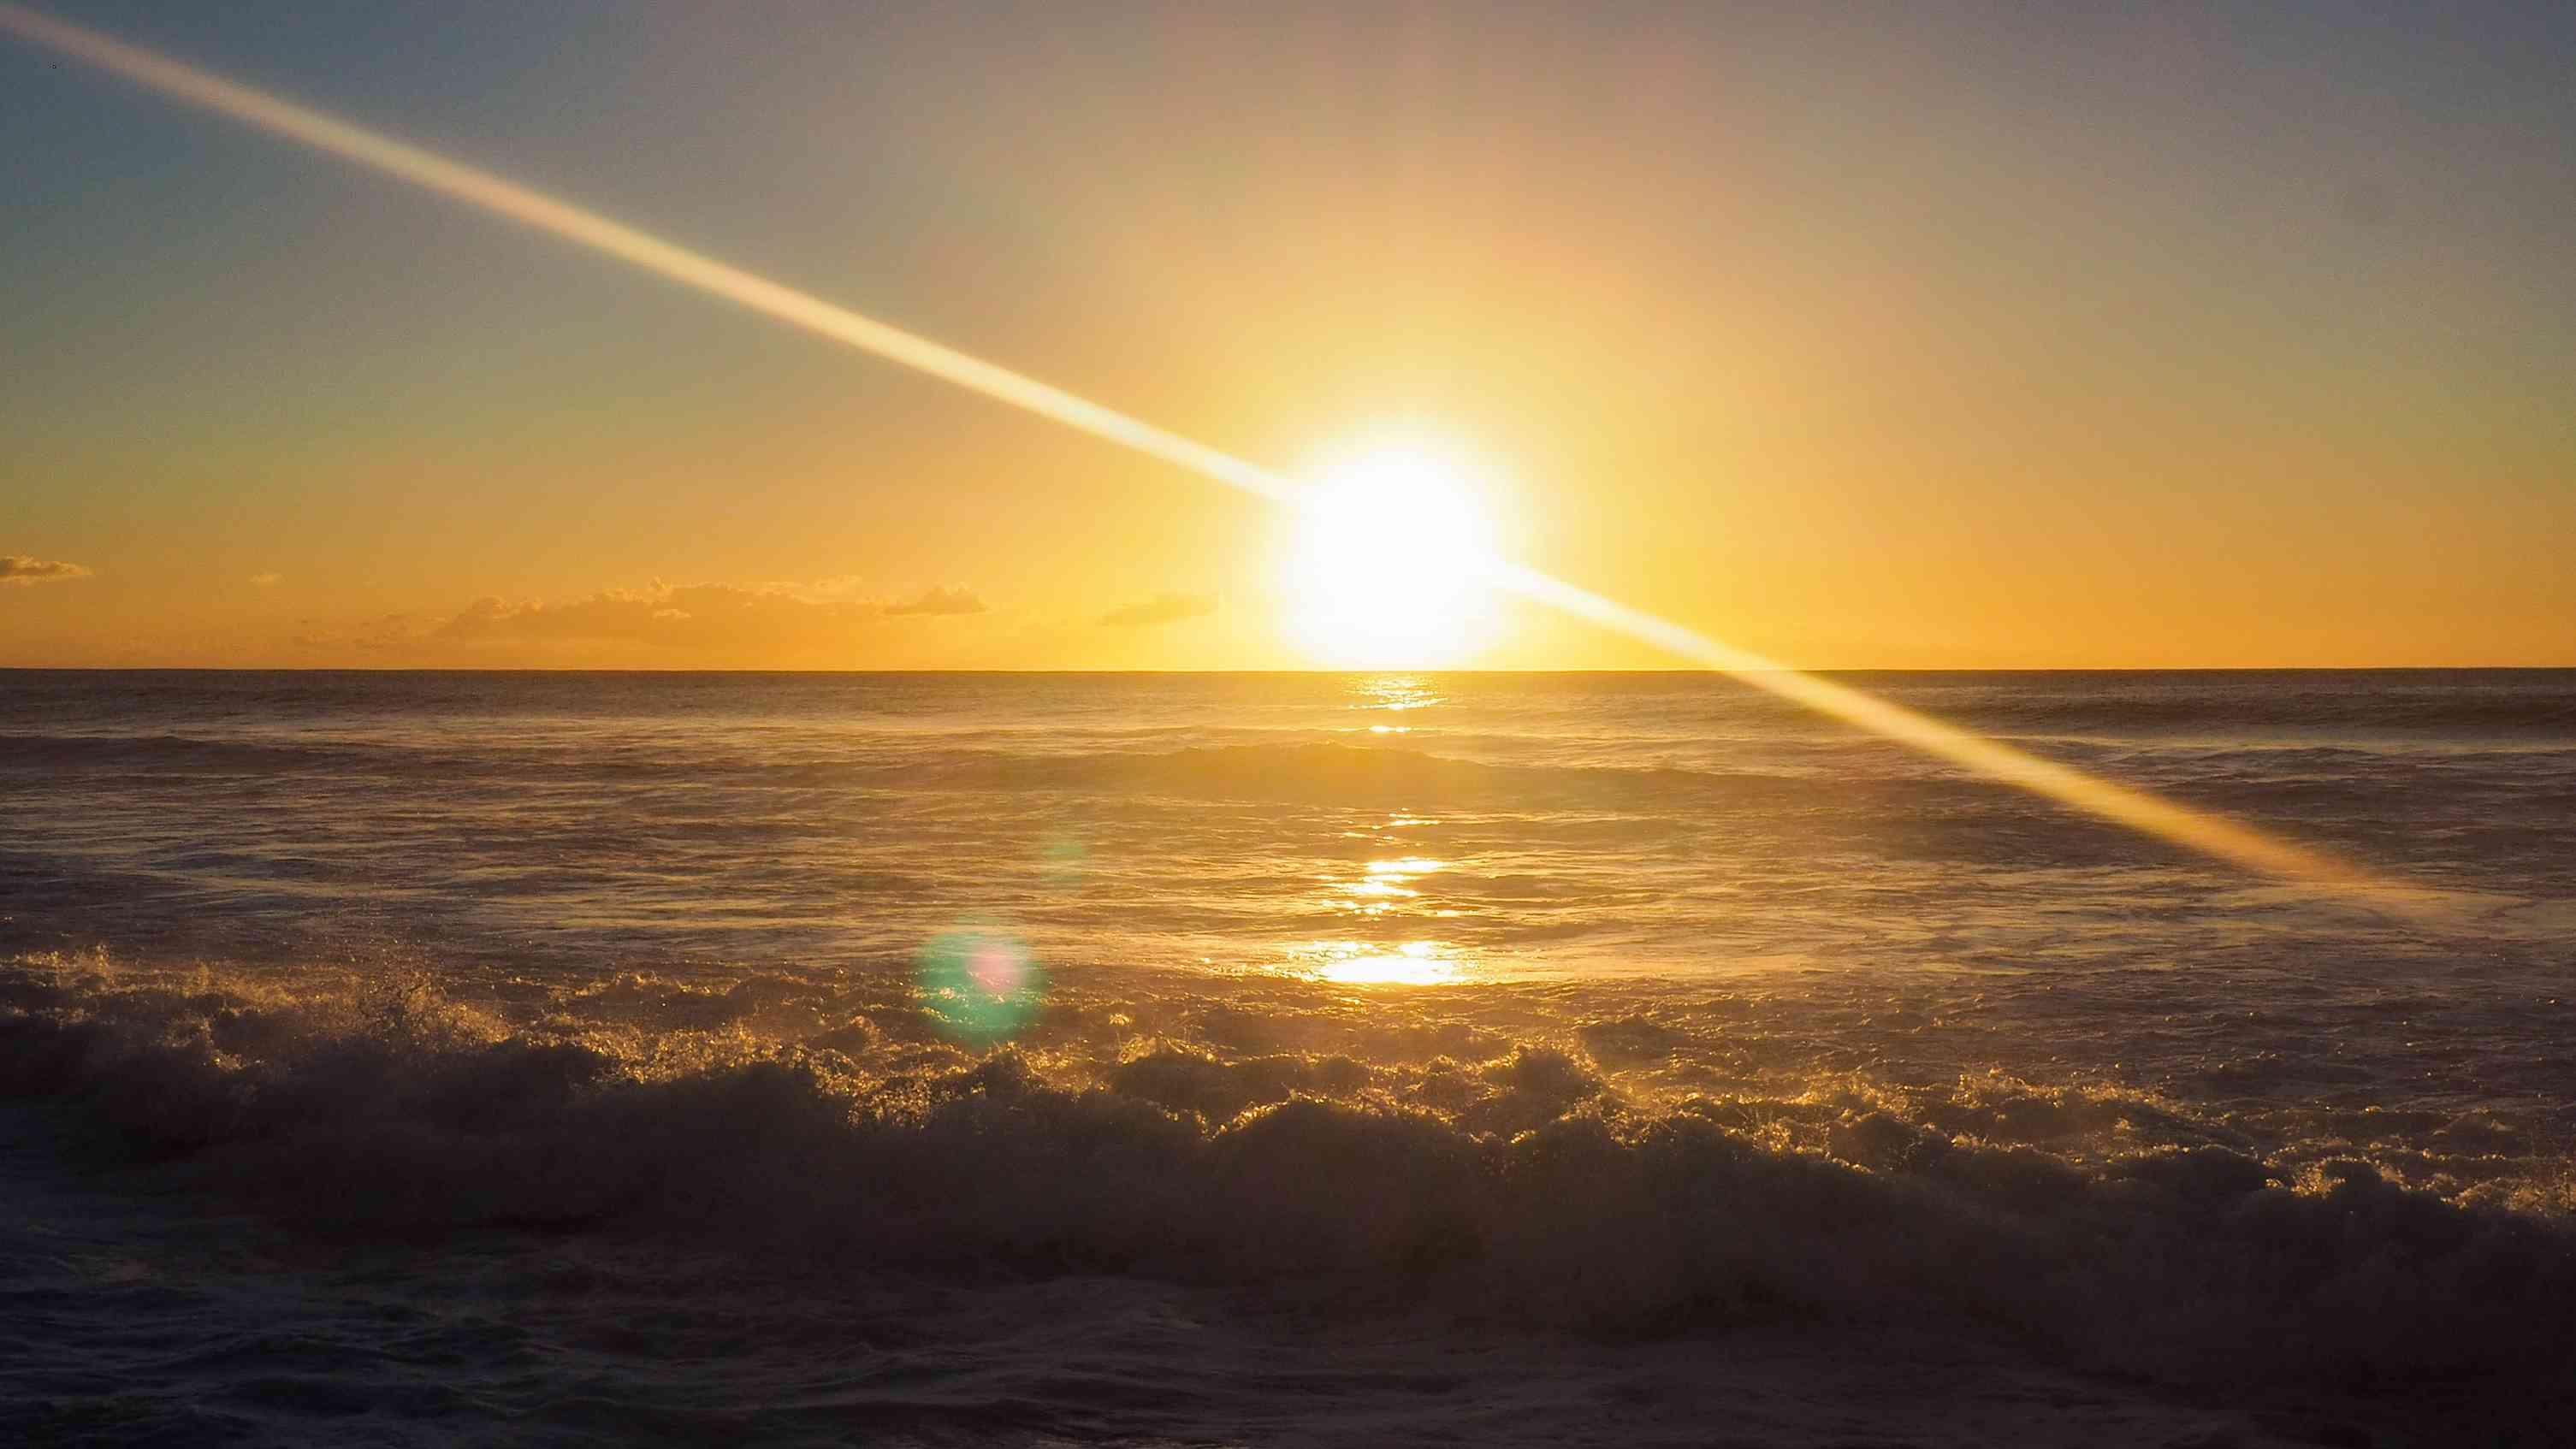 Sunset over the ocean on Waianae Coast